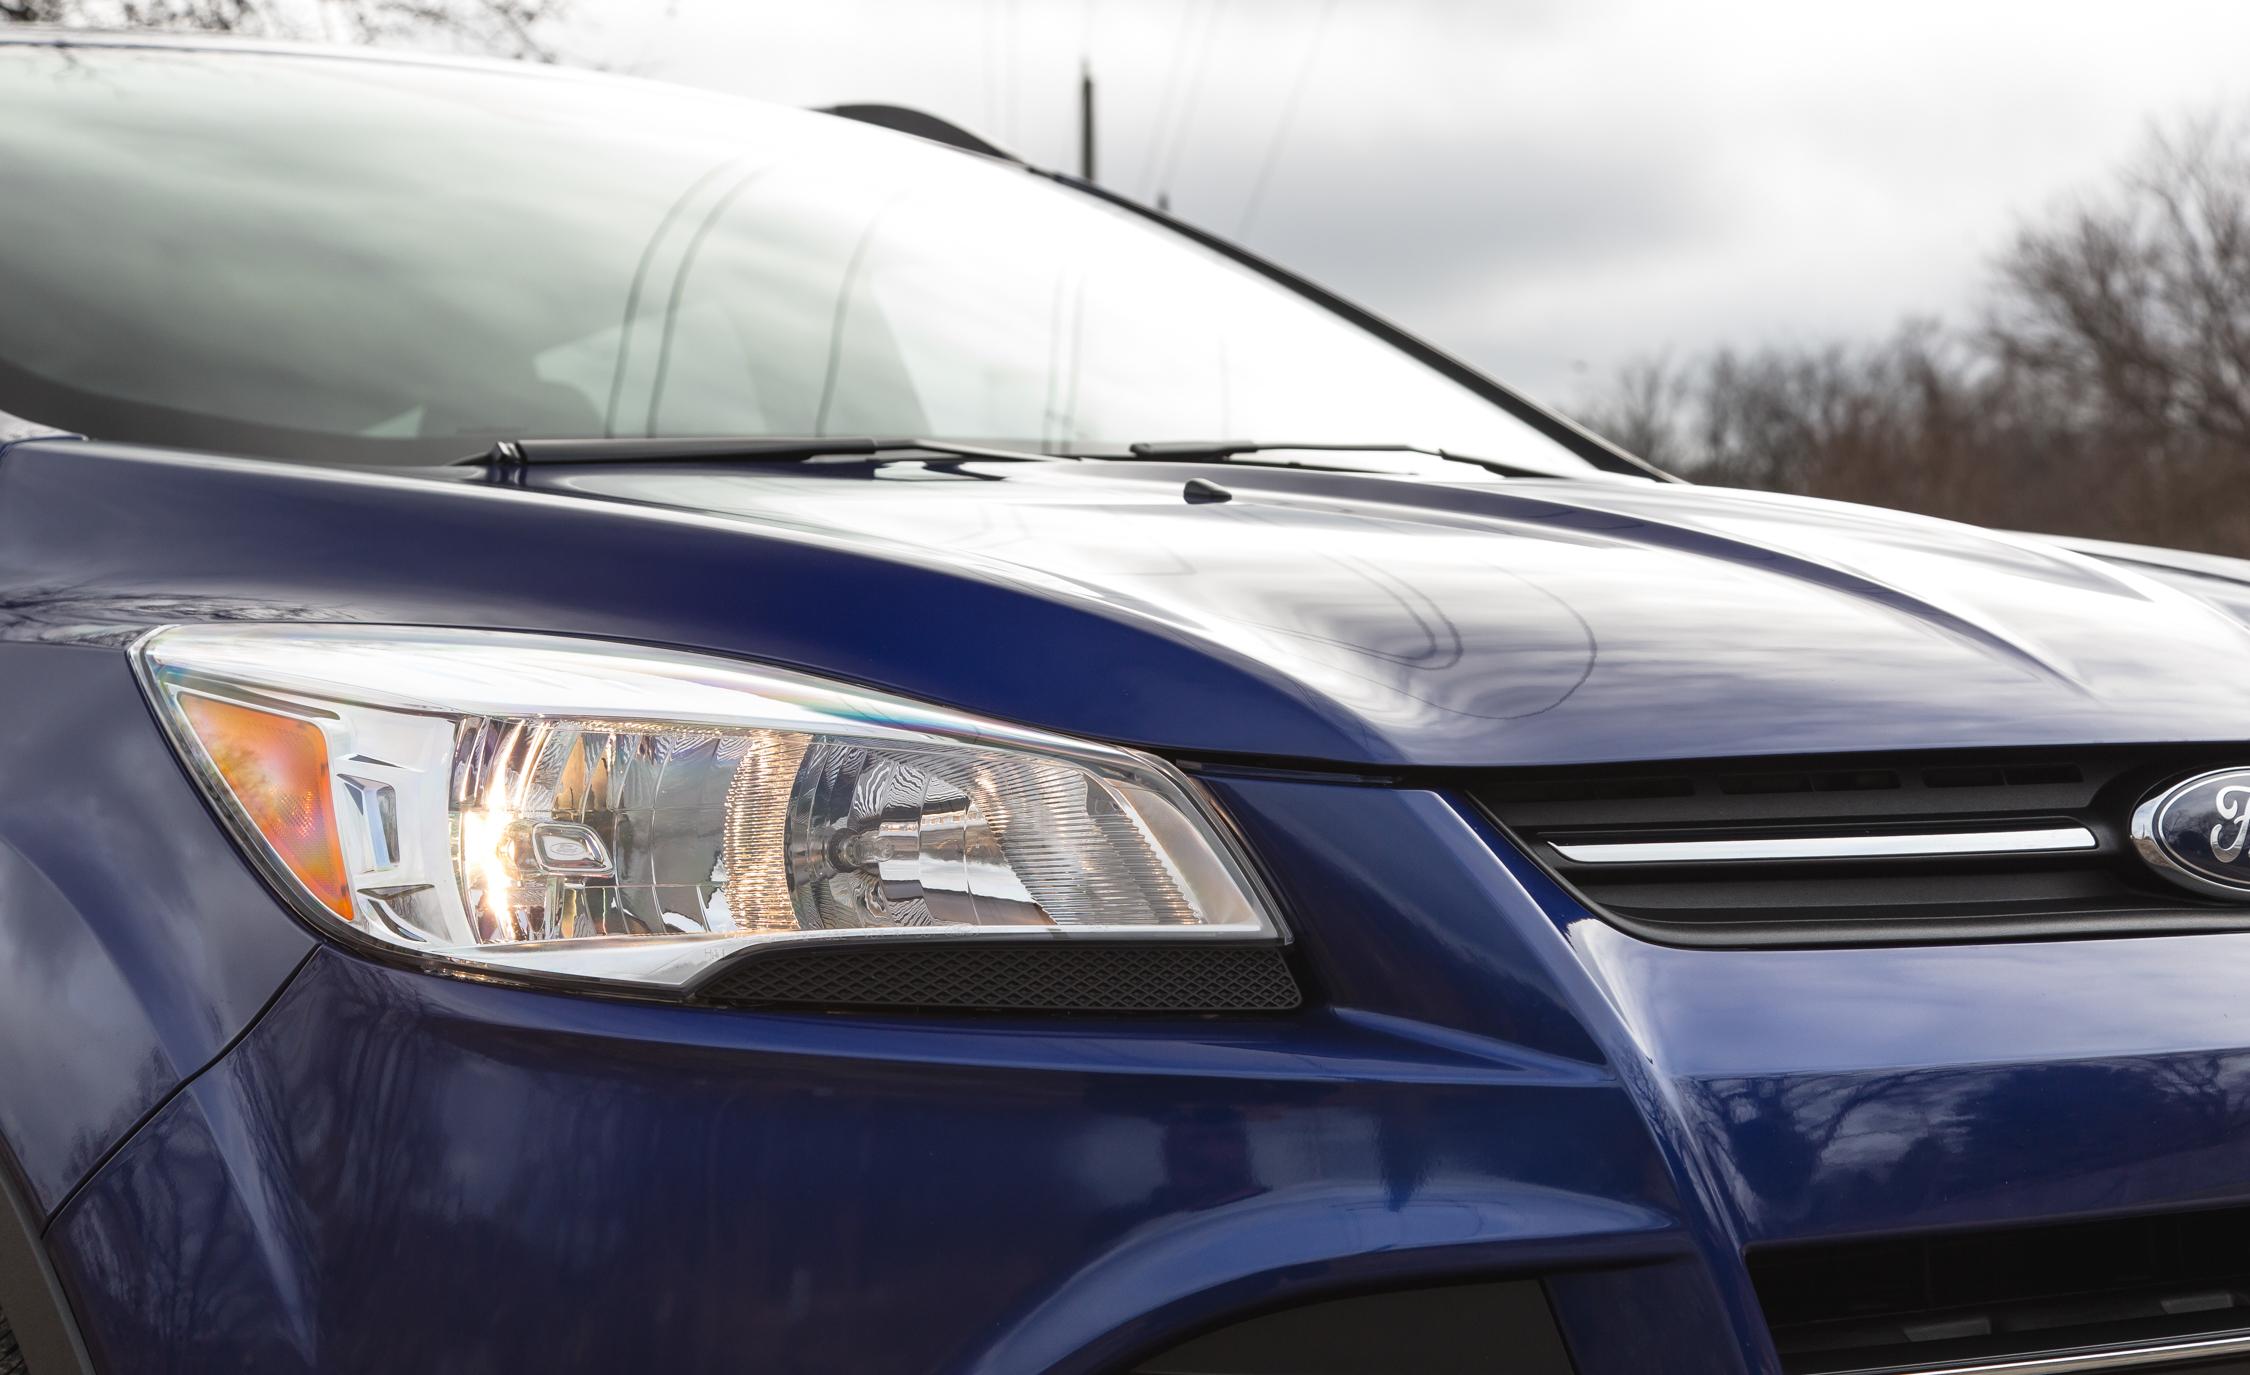 2016 Ford Escape Ecoboost SE Exterior Headlight